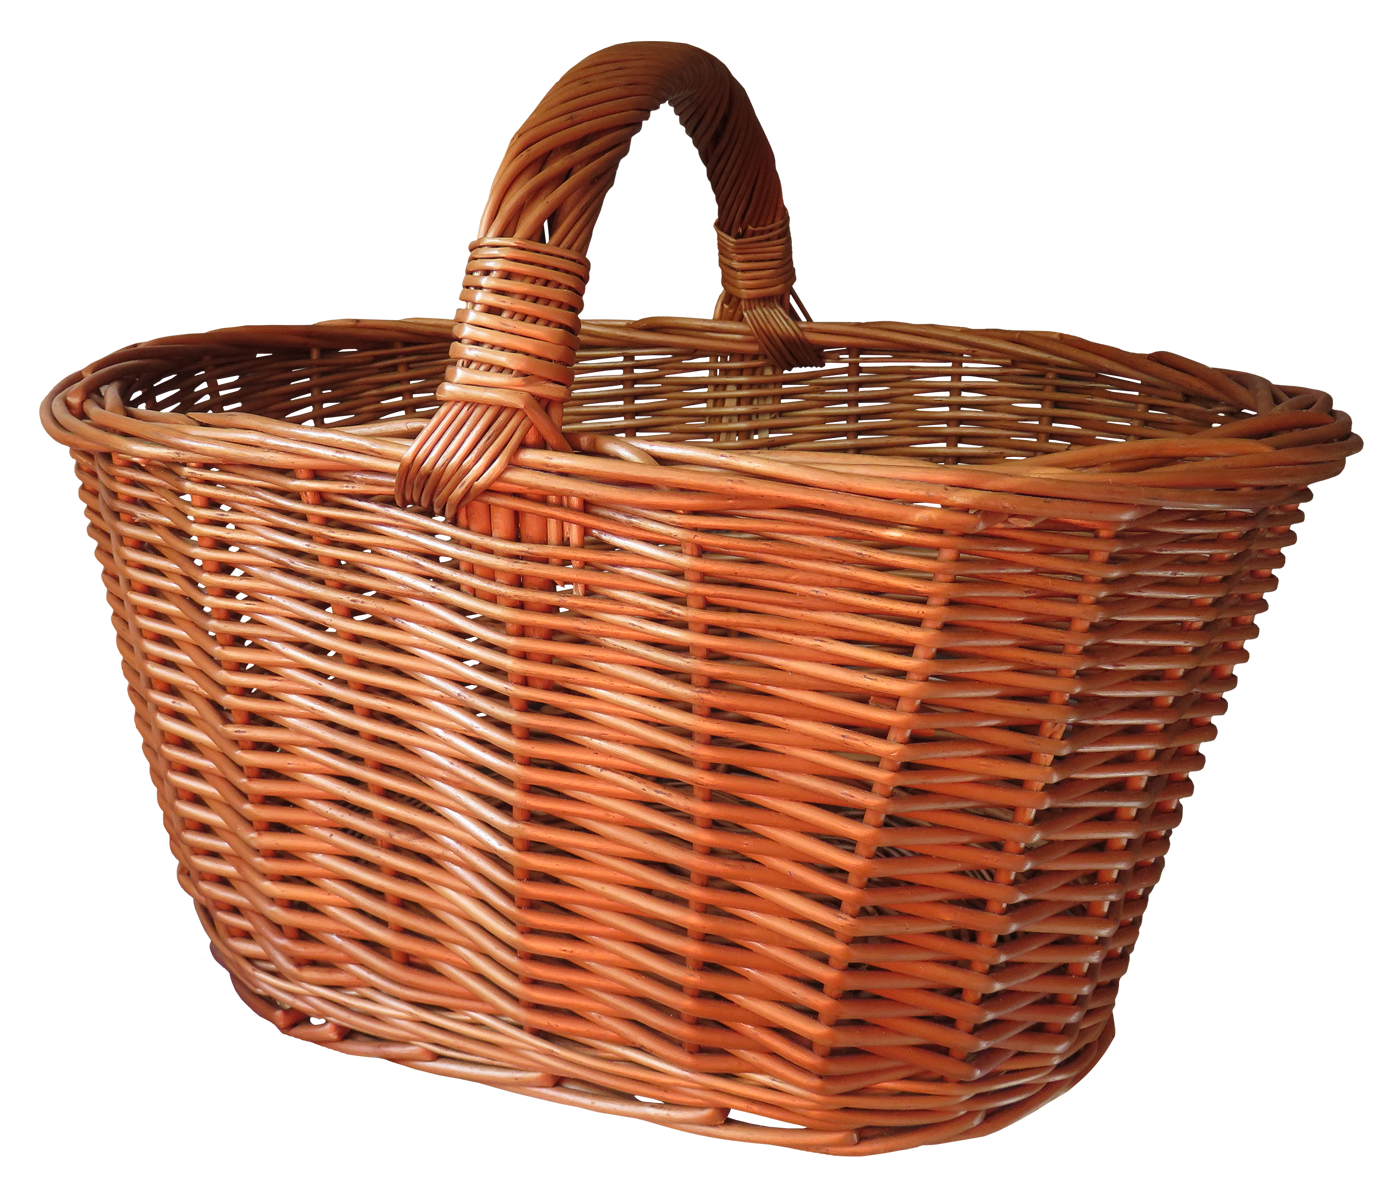 Shopping Basket PNG Transparent Image.